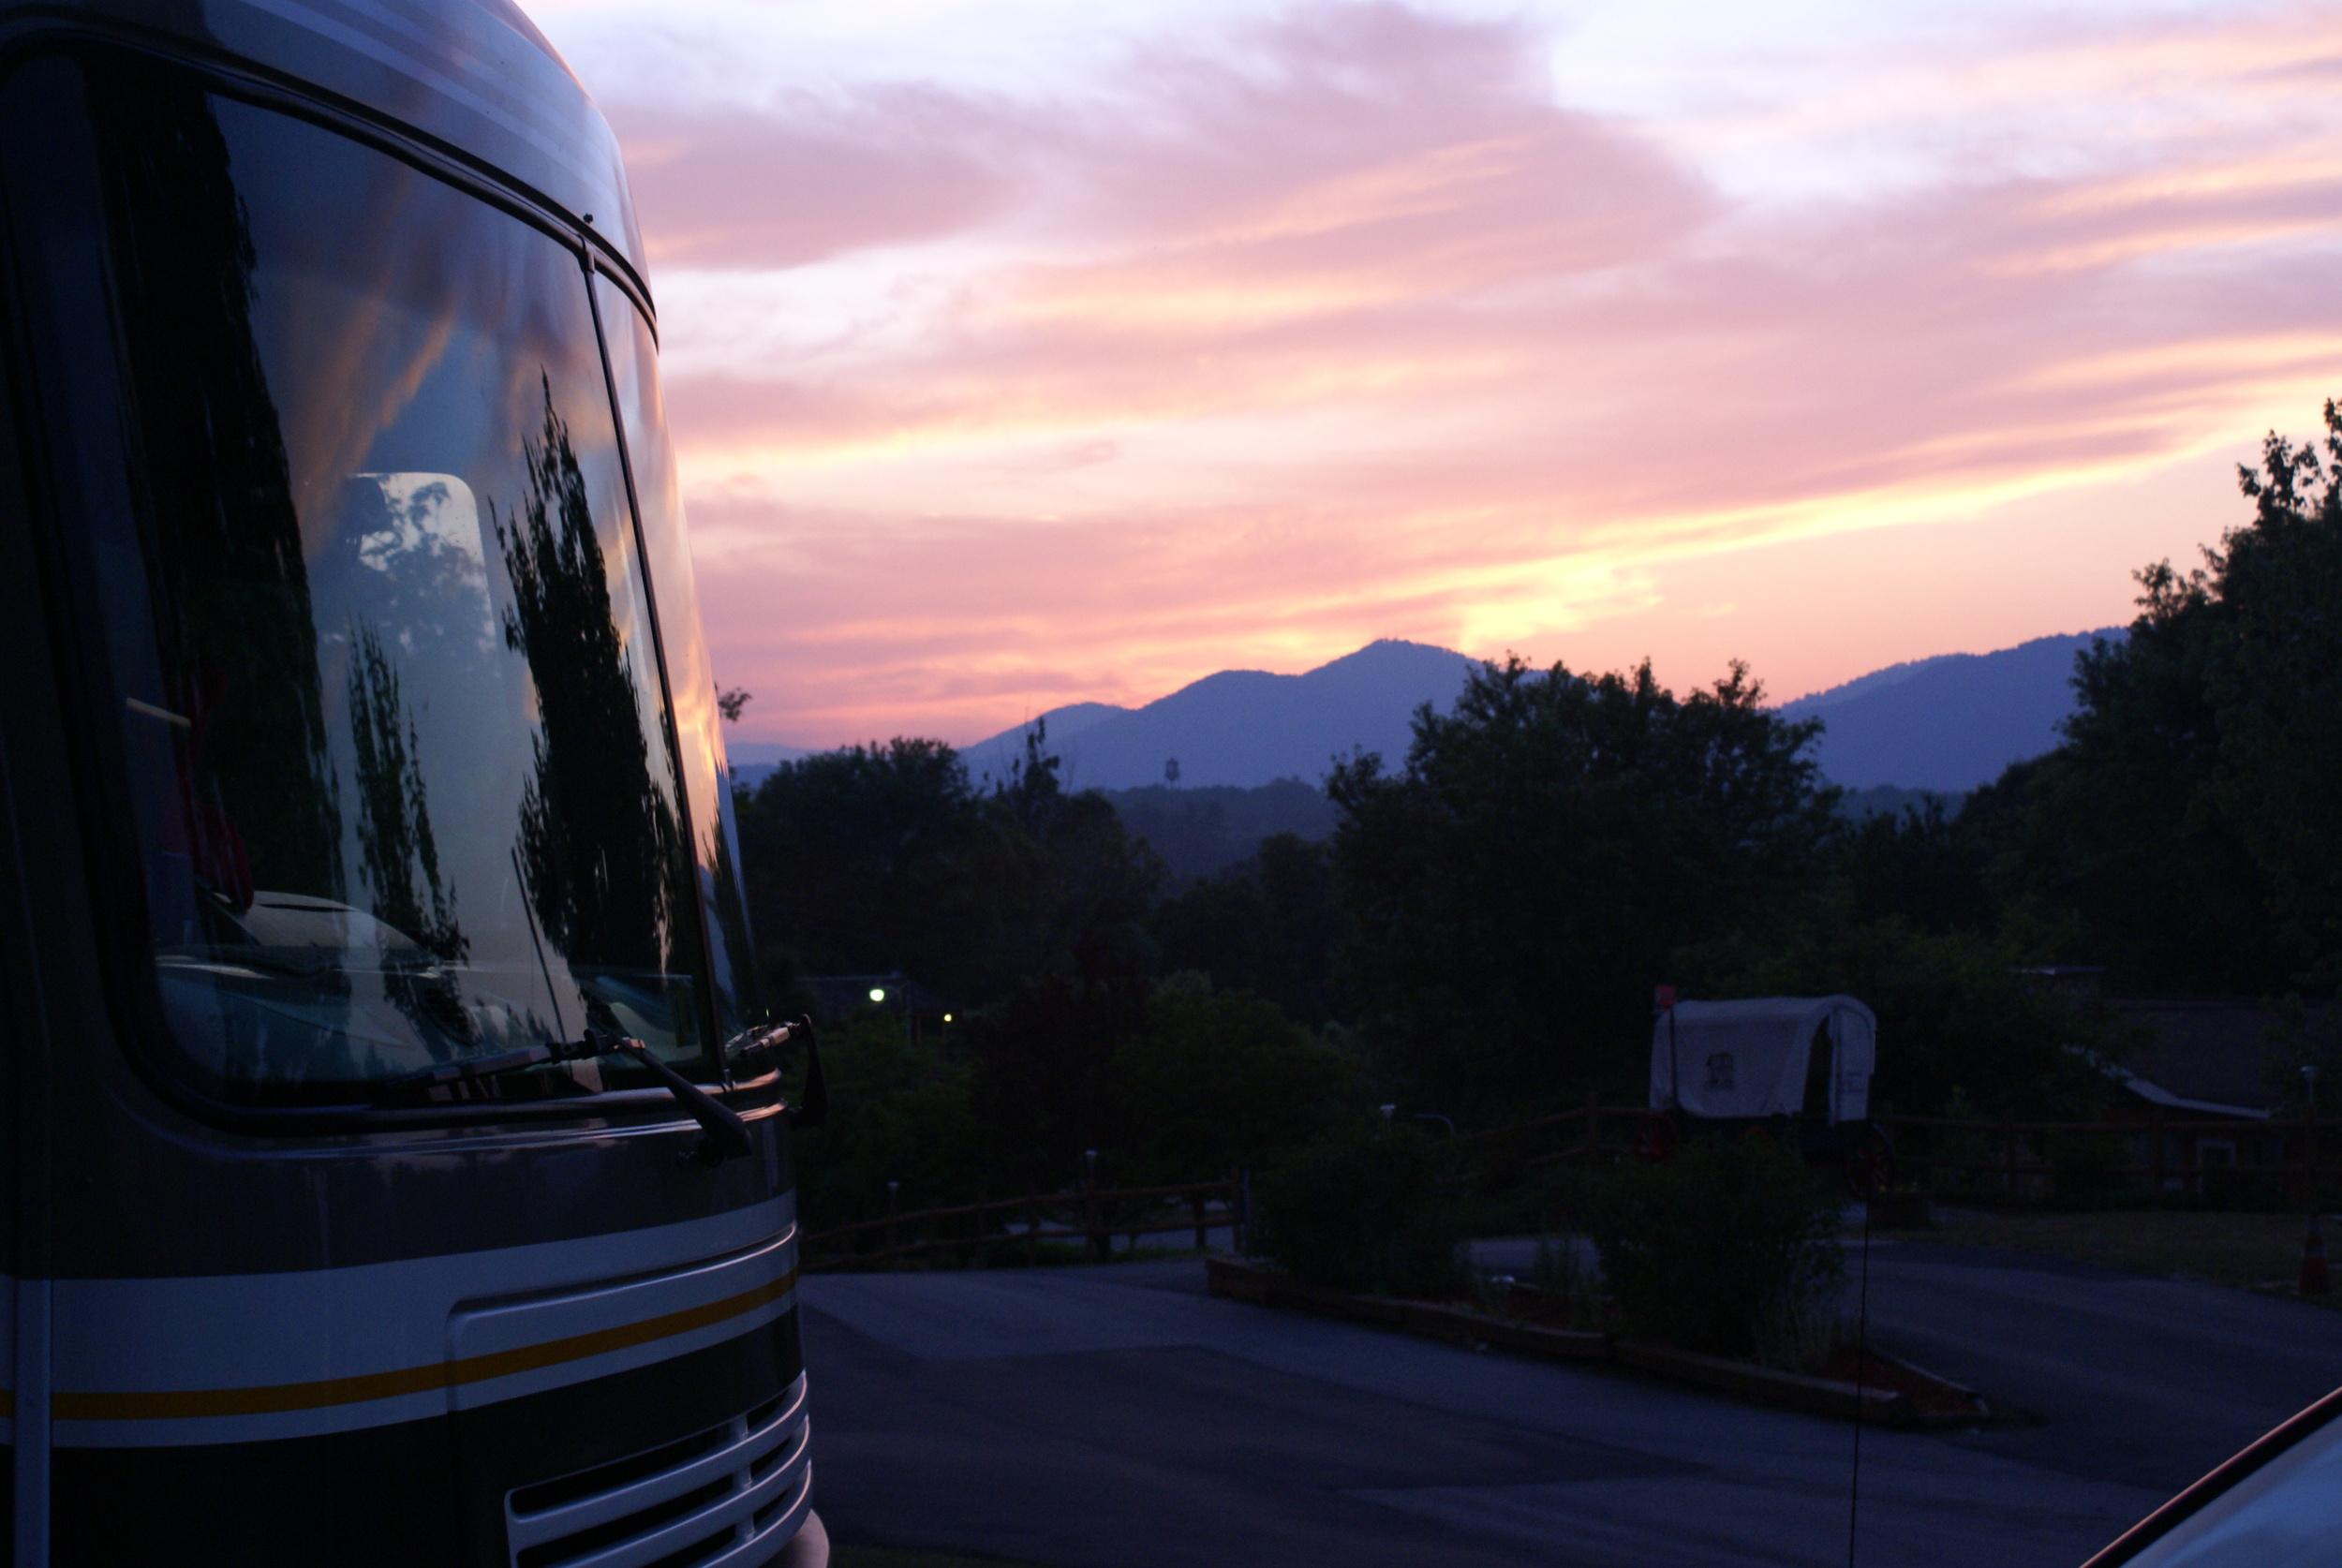 Sunset over Mount Pisgah